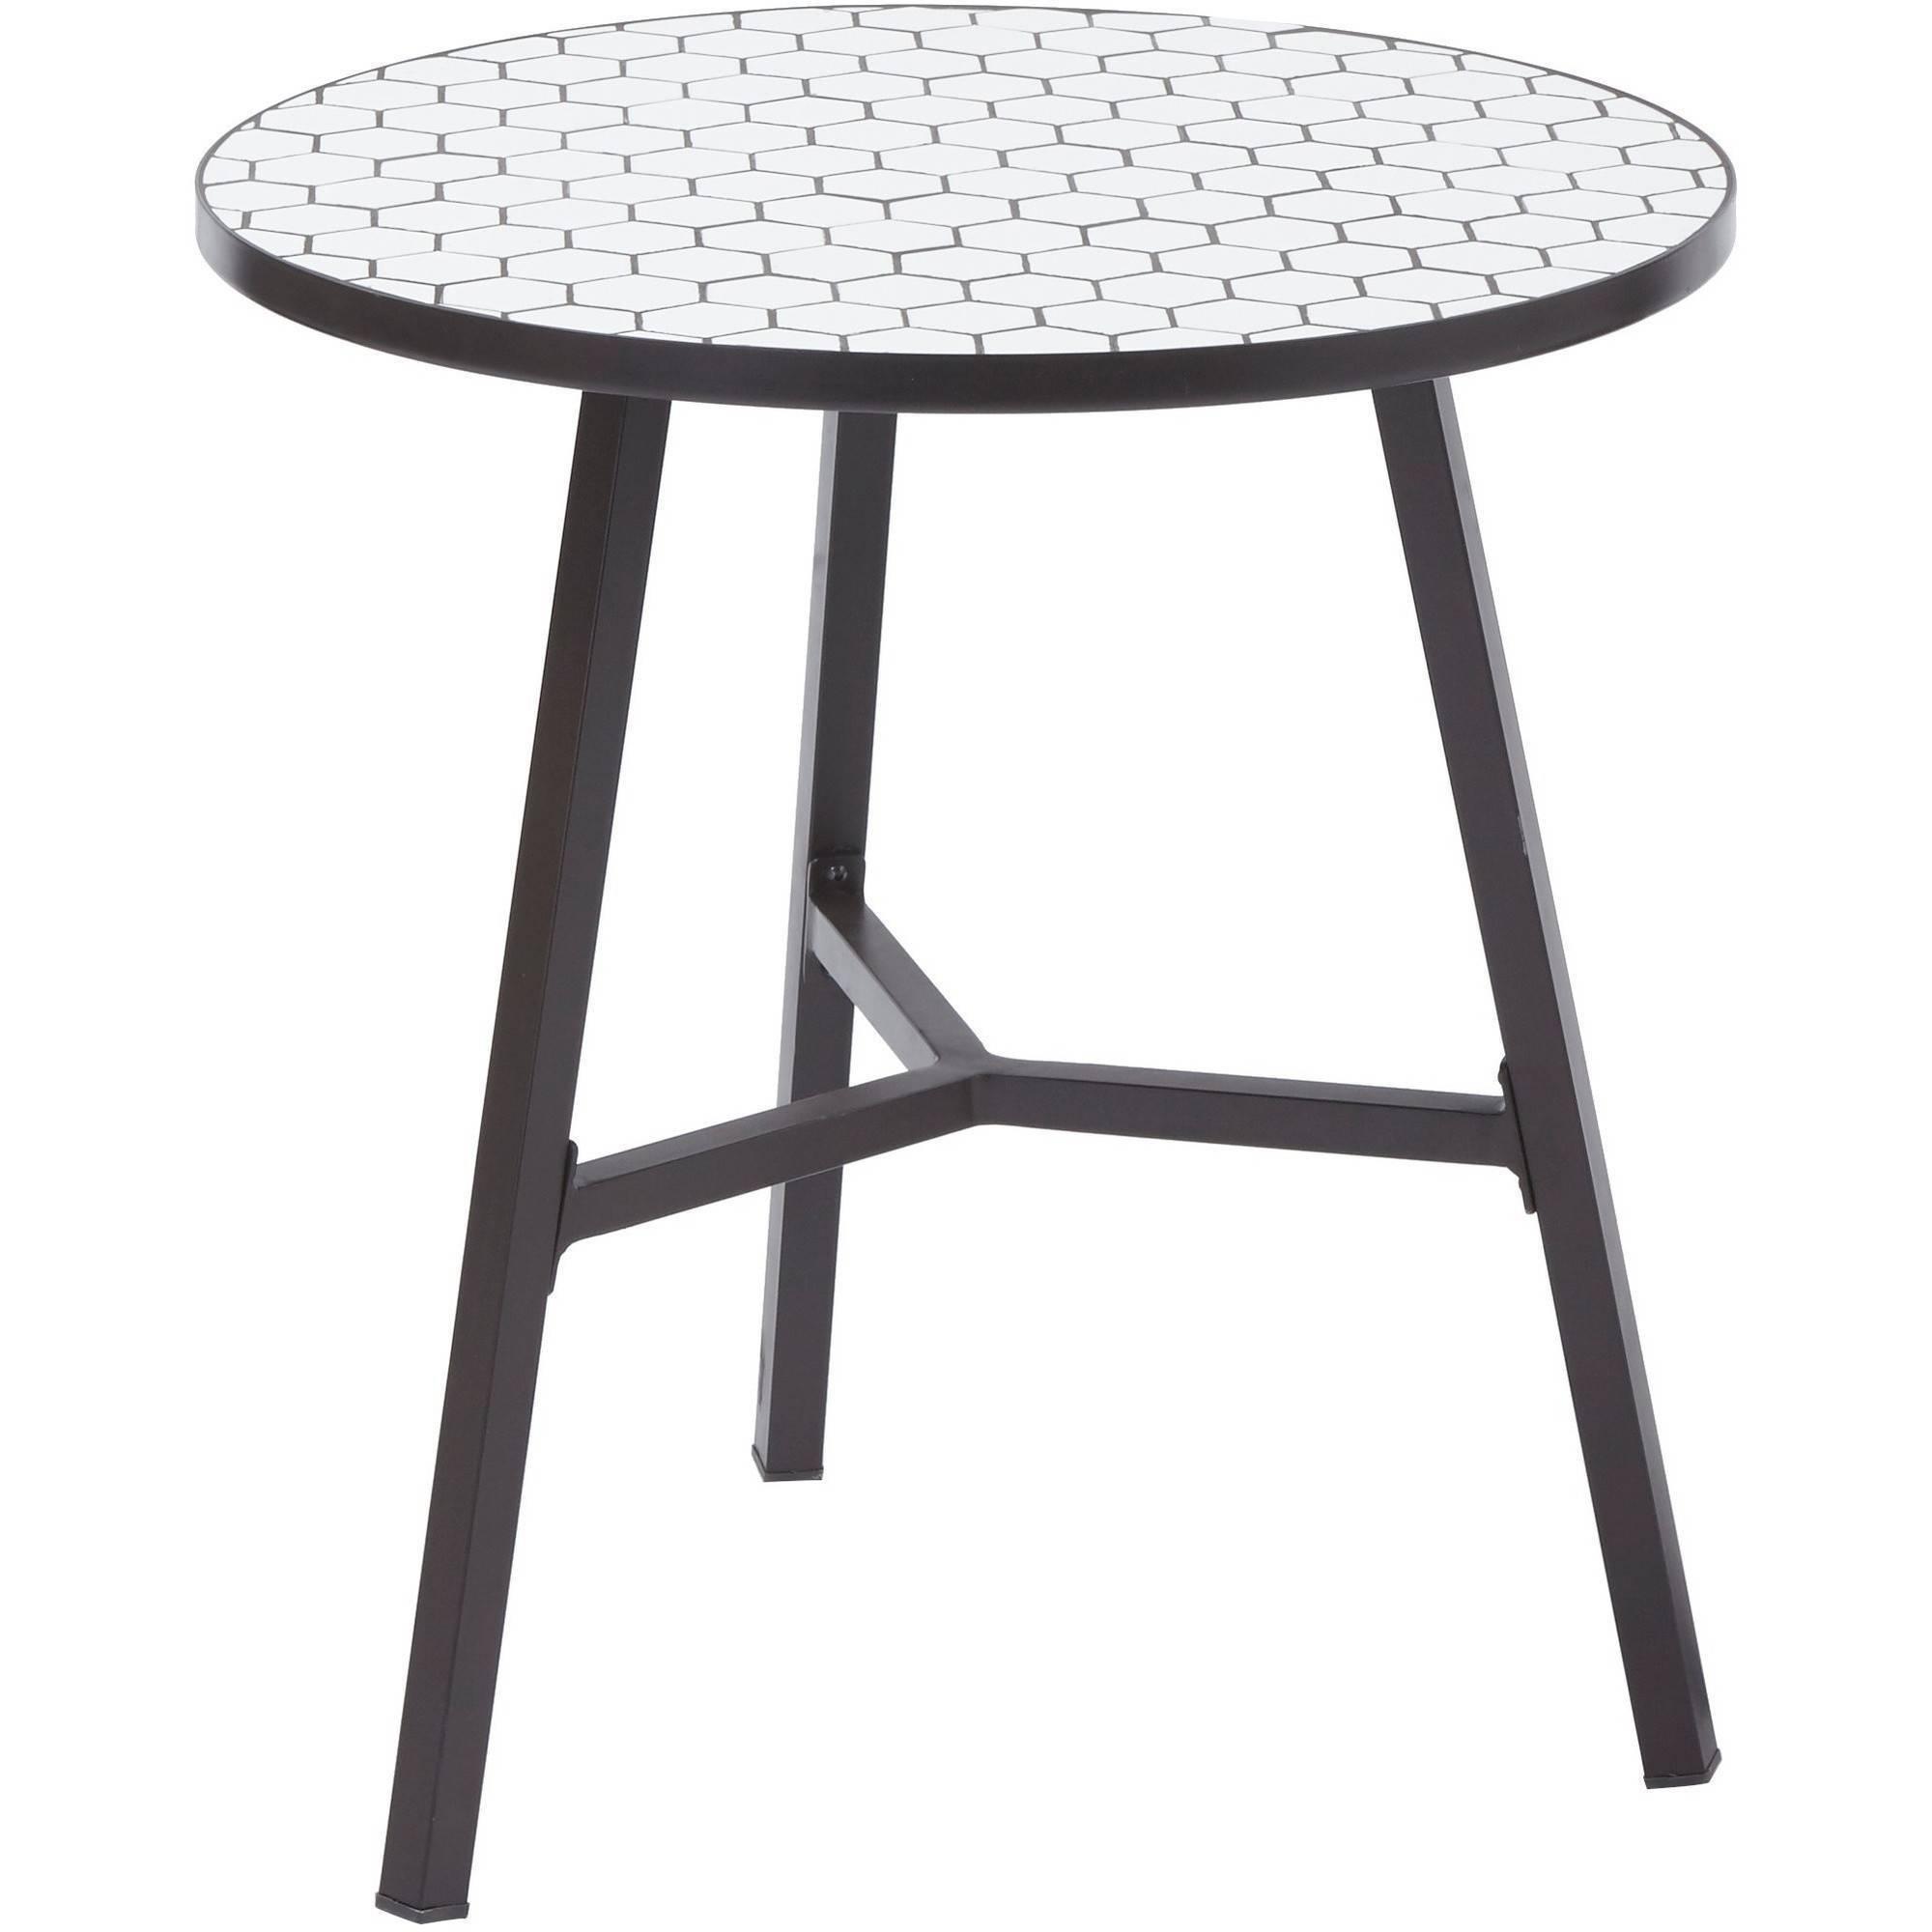 outdoor table patio furniture - walmart.com MTEGOHU